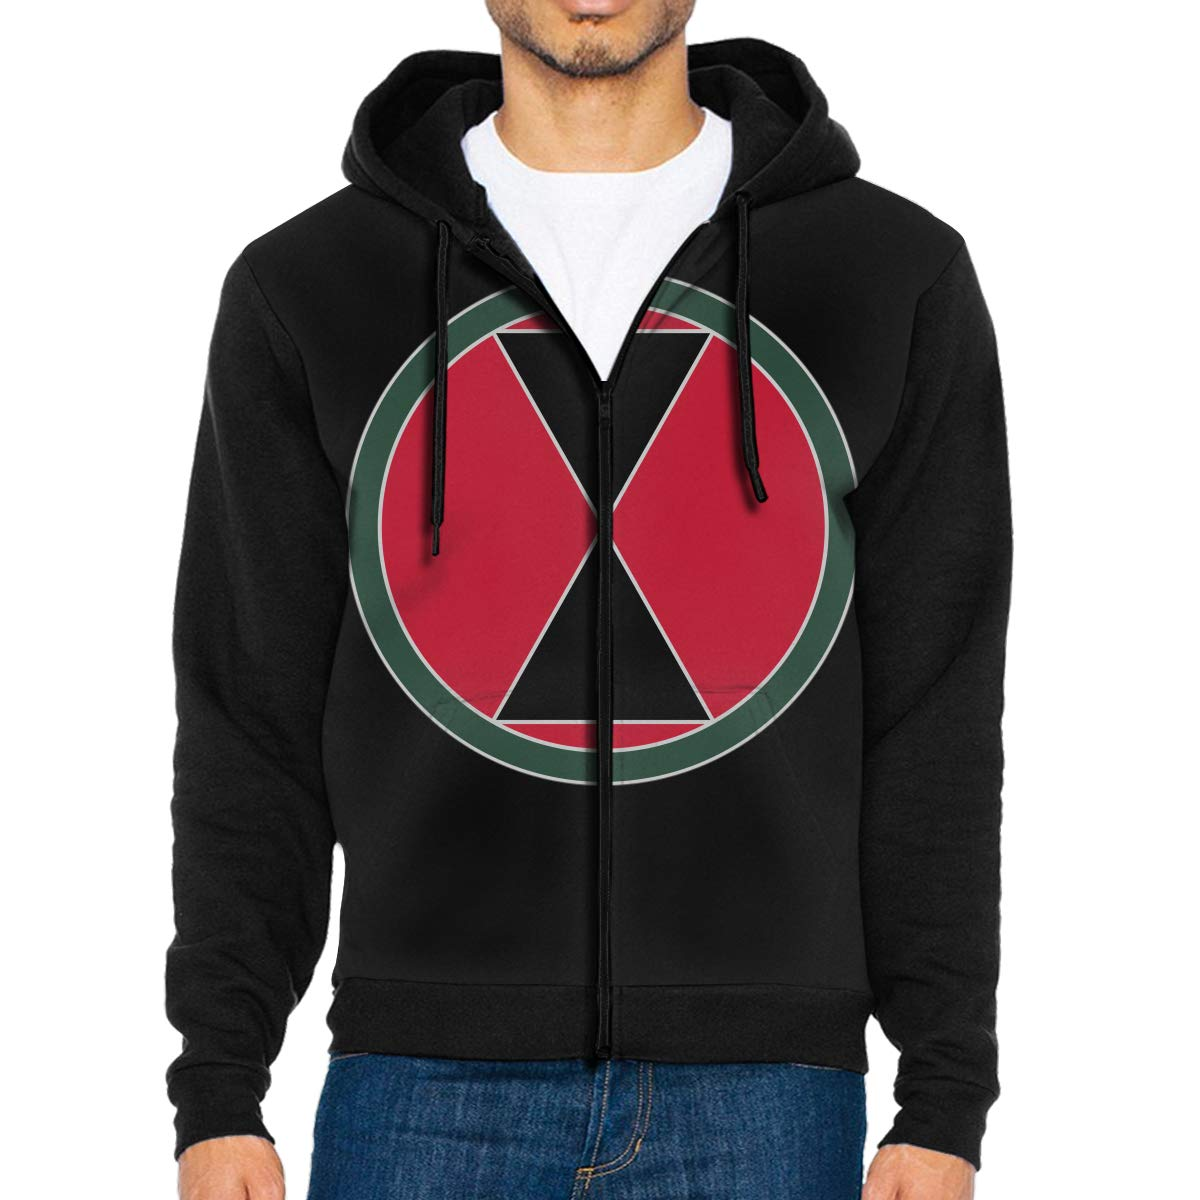 7th Infantry Division Mens Full-Zip Up Hoodie Jacket Pullover Sweatshirt